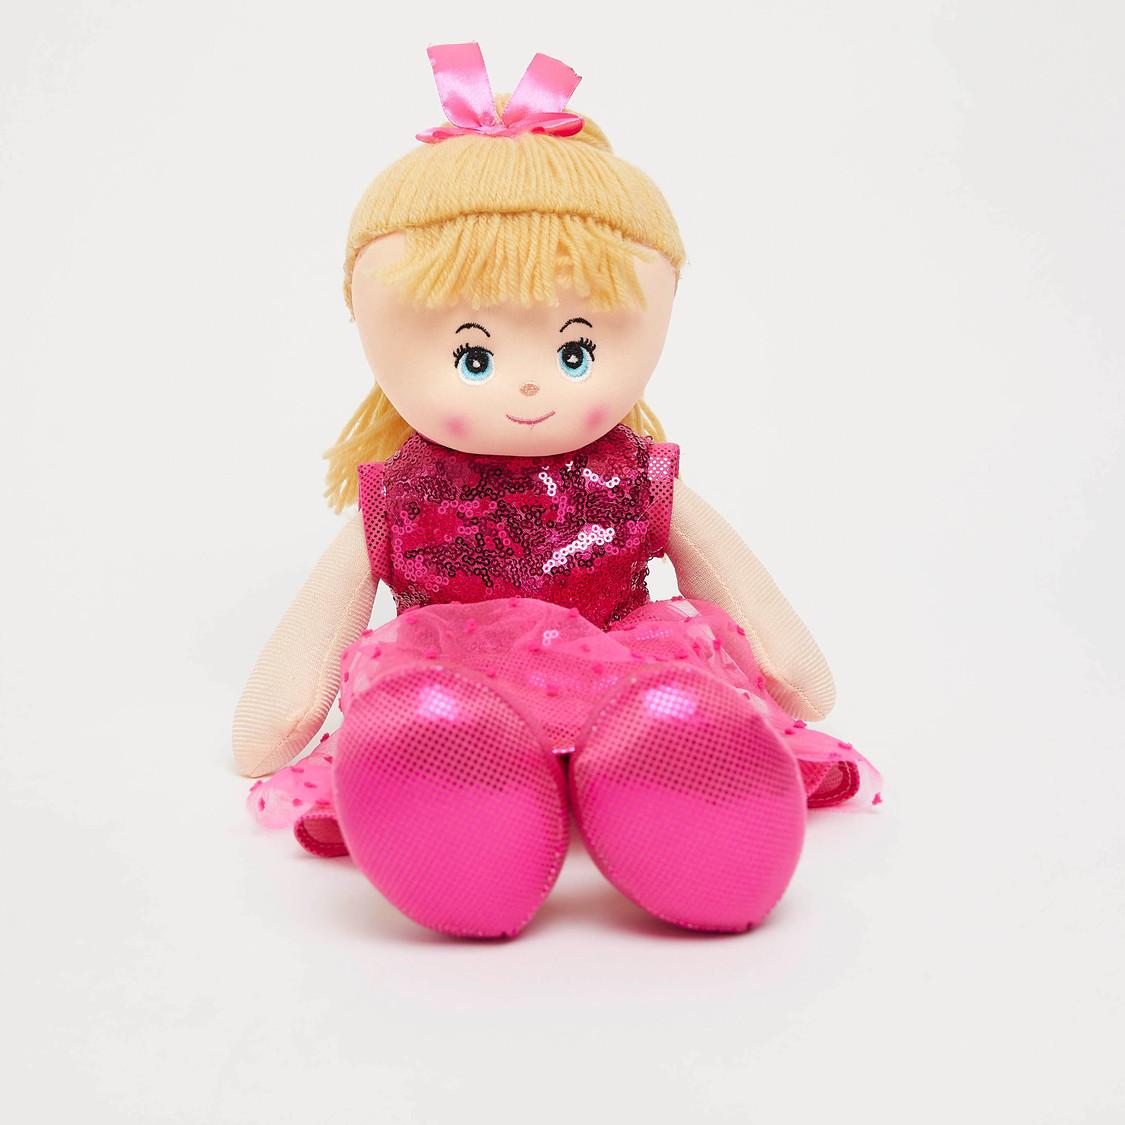 Stuffed Doll in Sequinned Dress